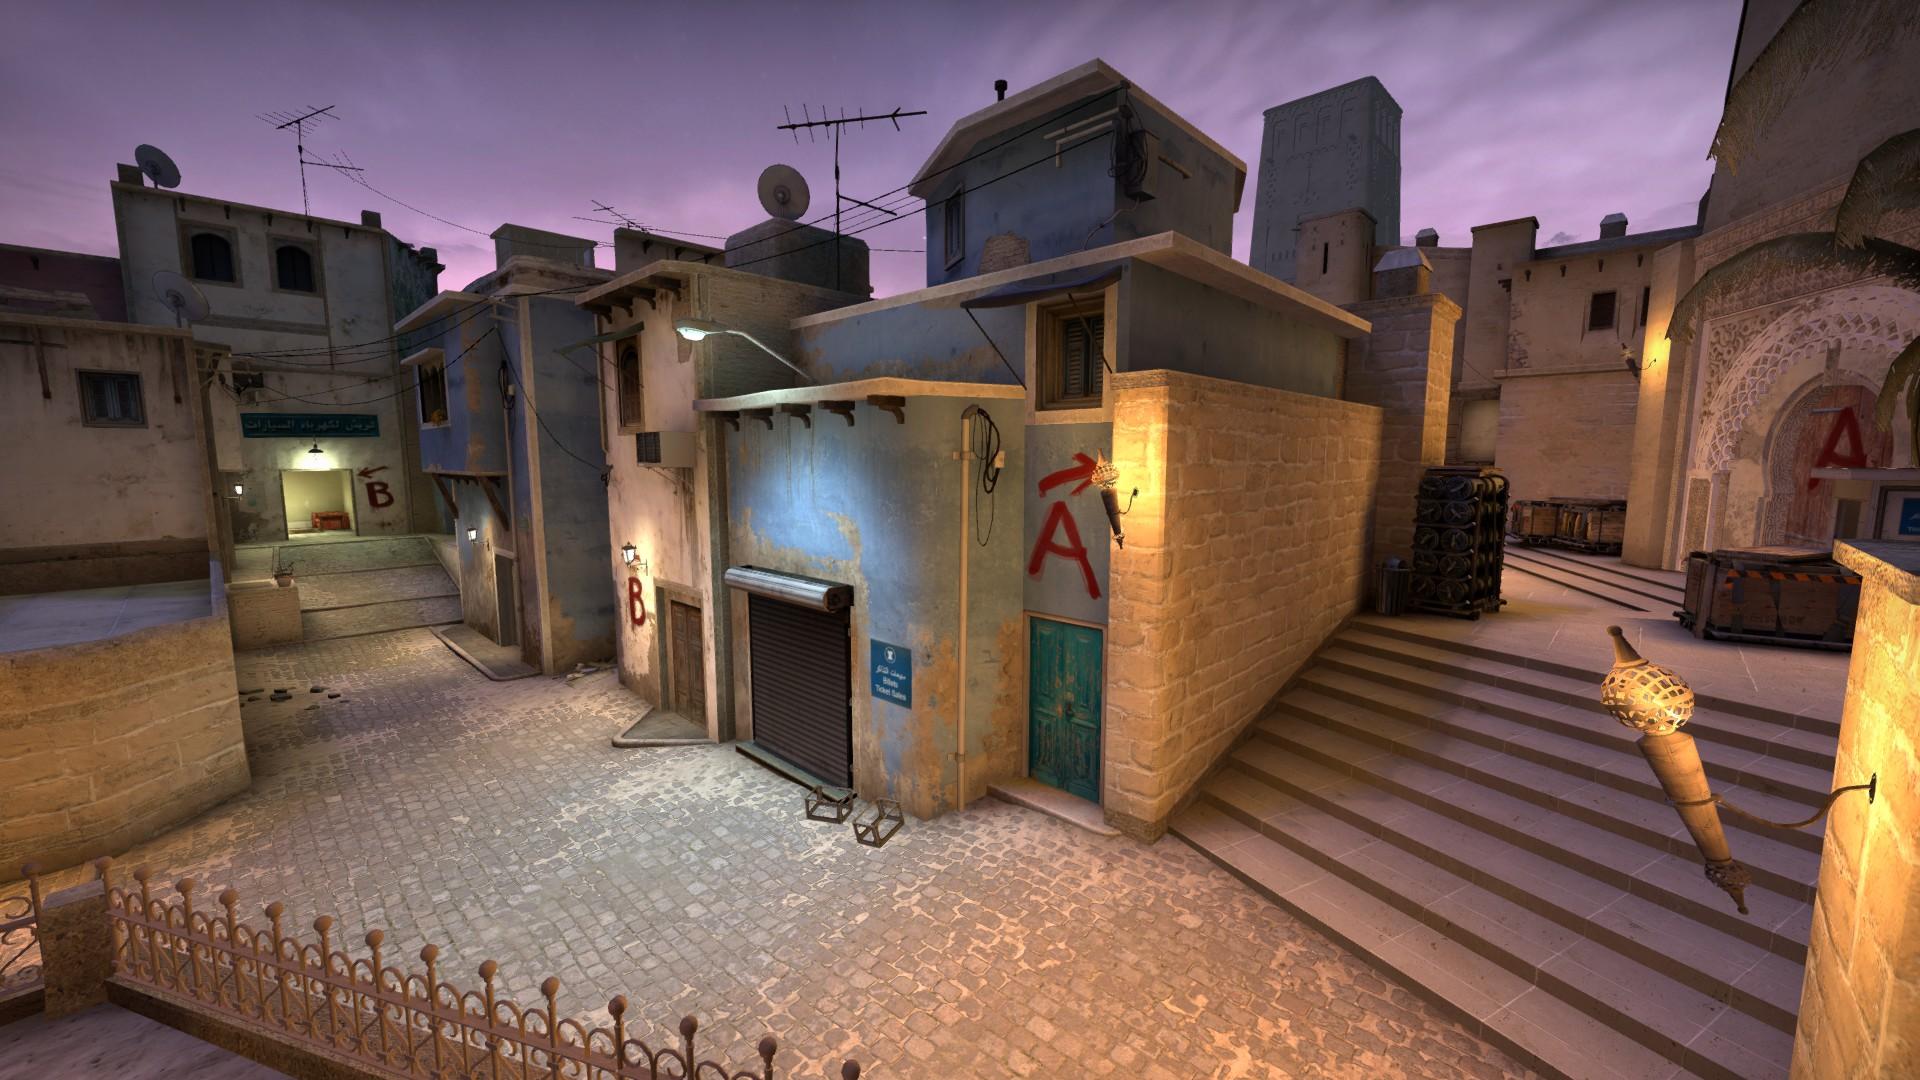 Battlefield 4 Wallpaper Hd Nocna Wersja Mirage W Cs Go